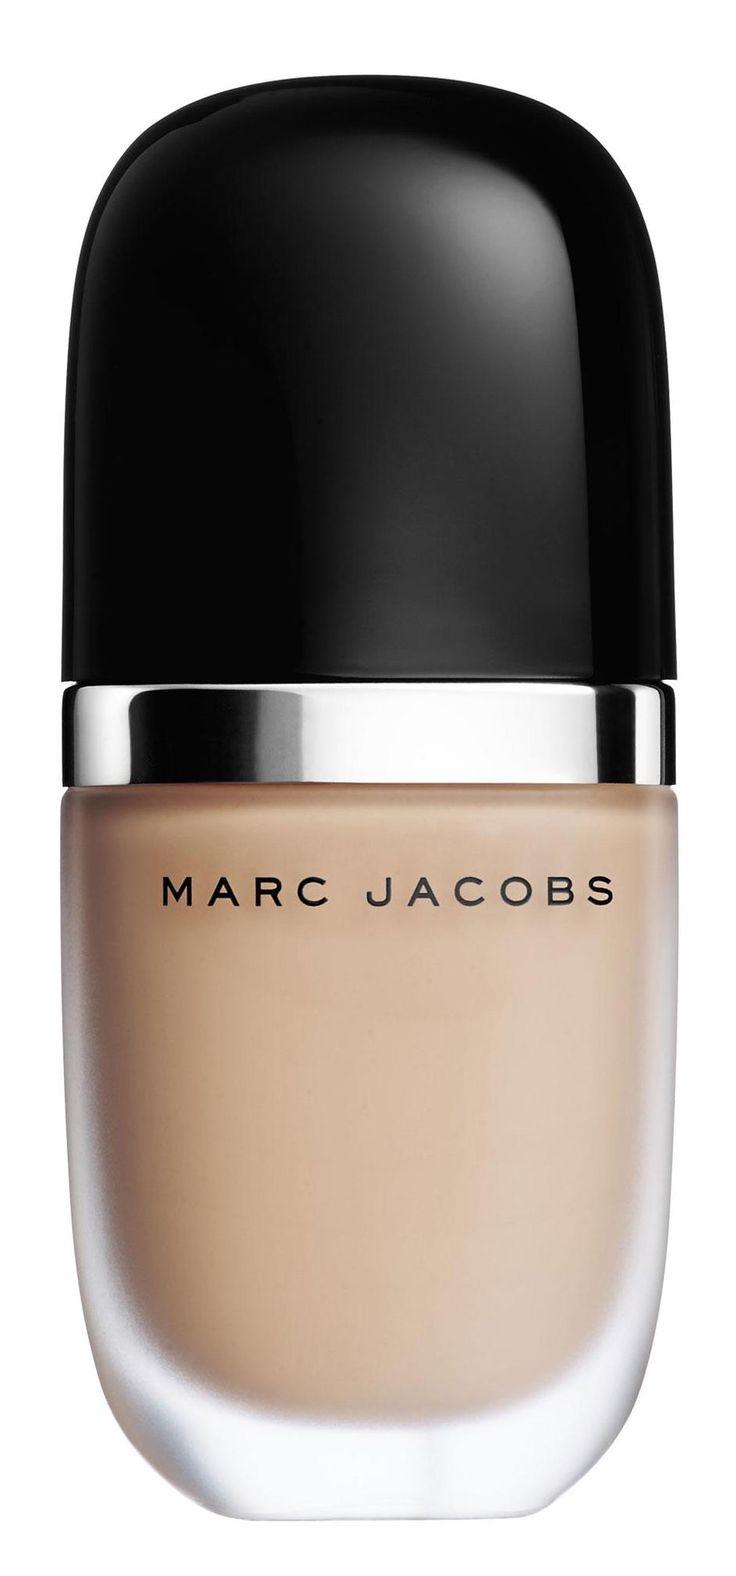 Marc Jacobs - Genius Gel Supercharged Foundation in Beige Deep (38) (Best Blush Benefit)